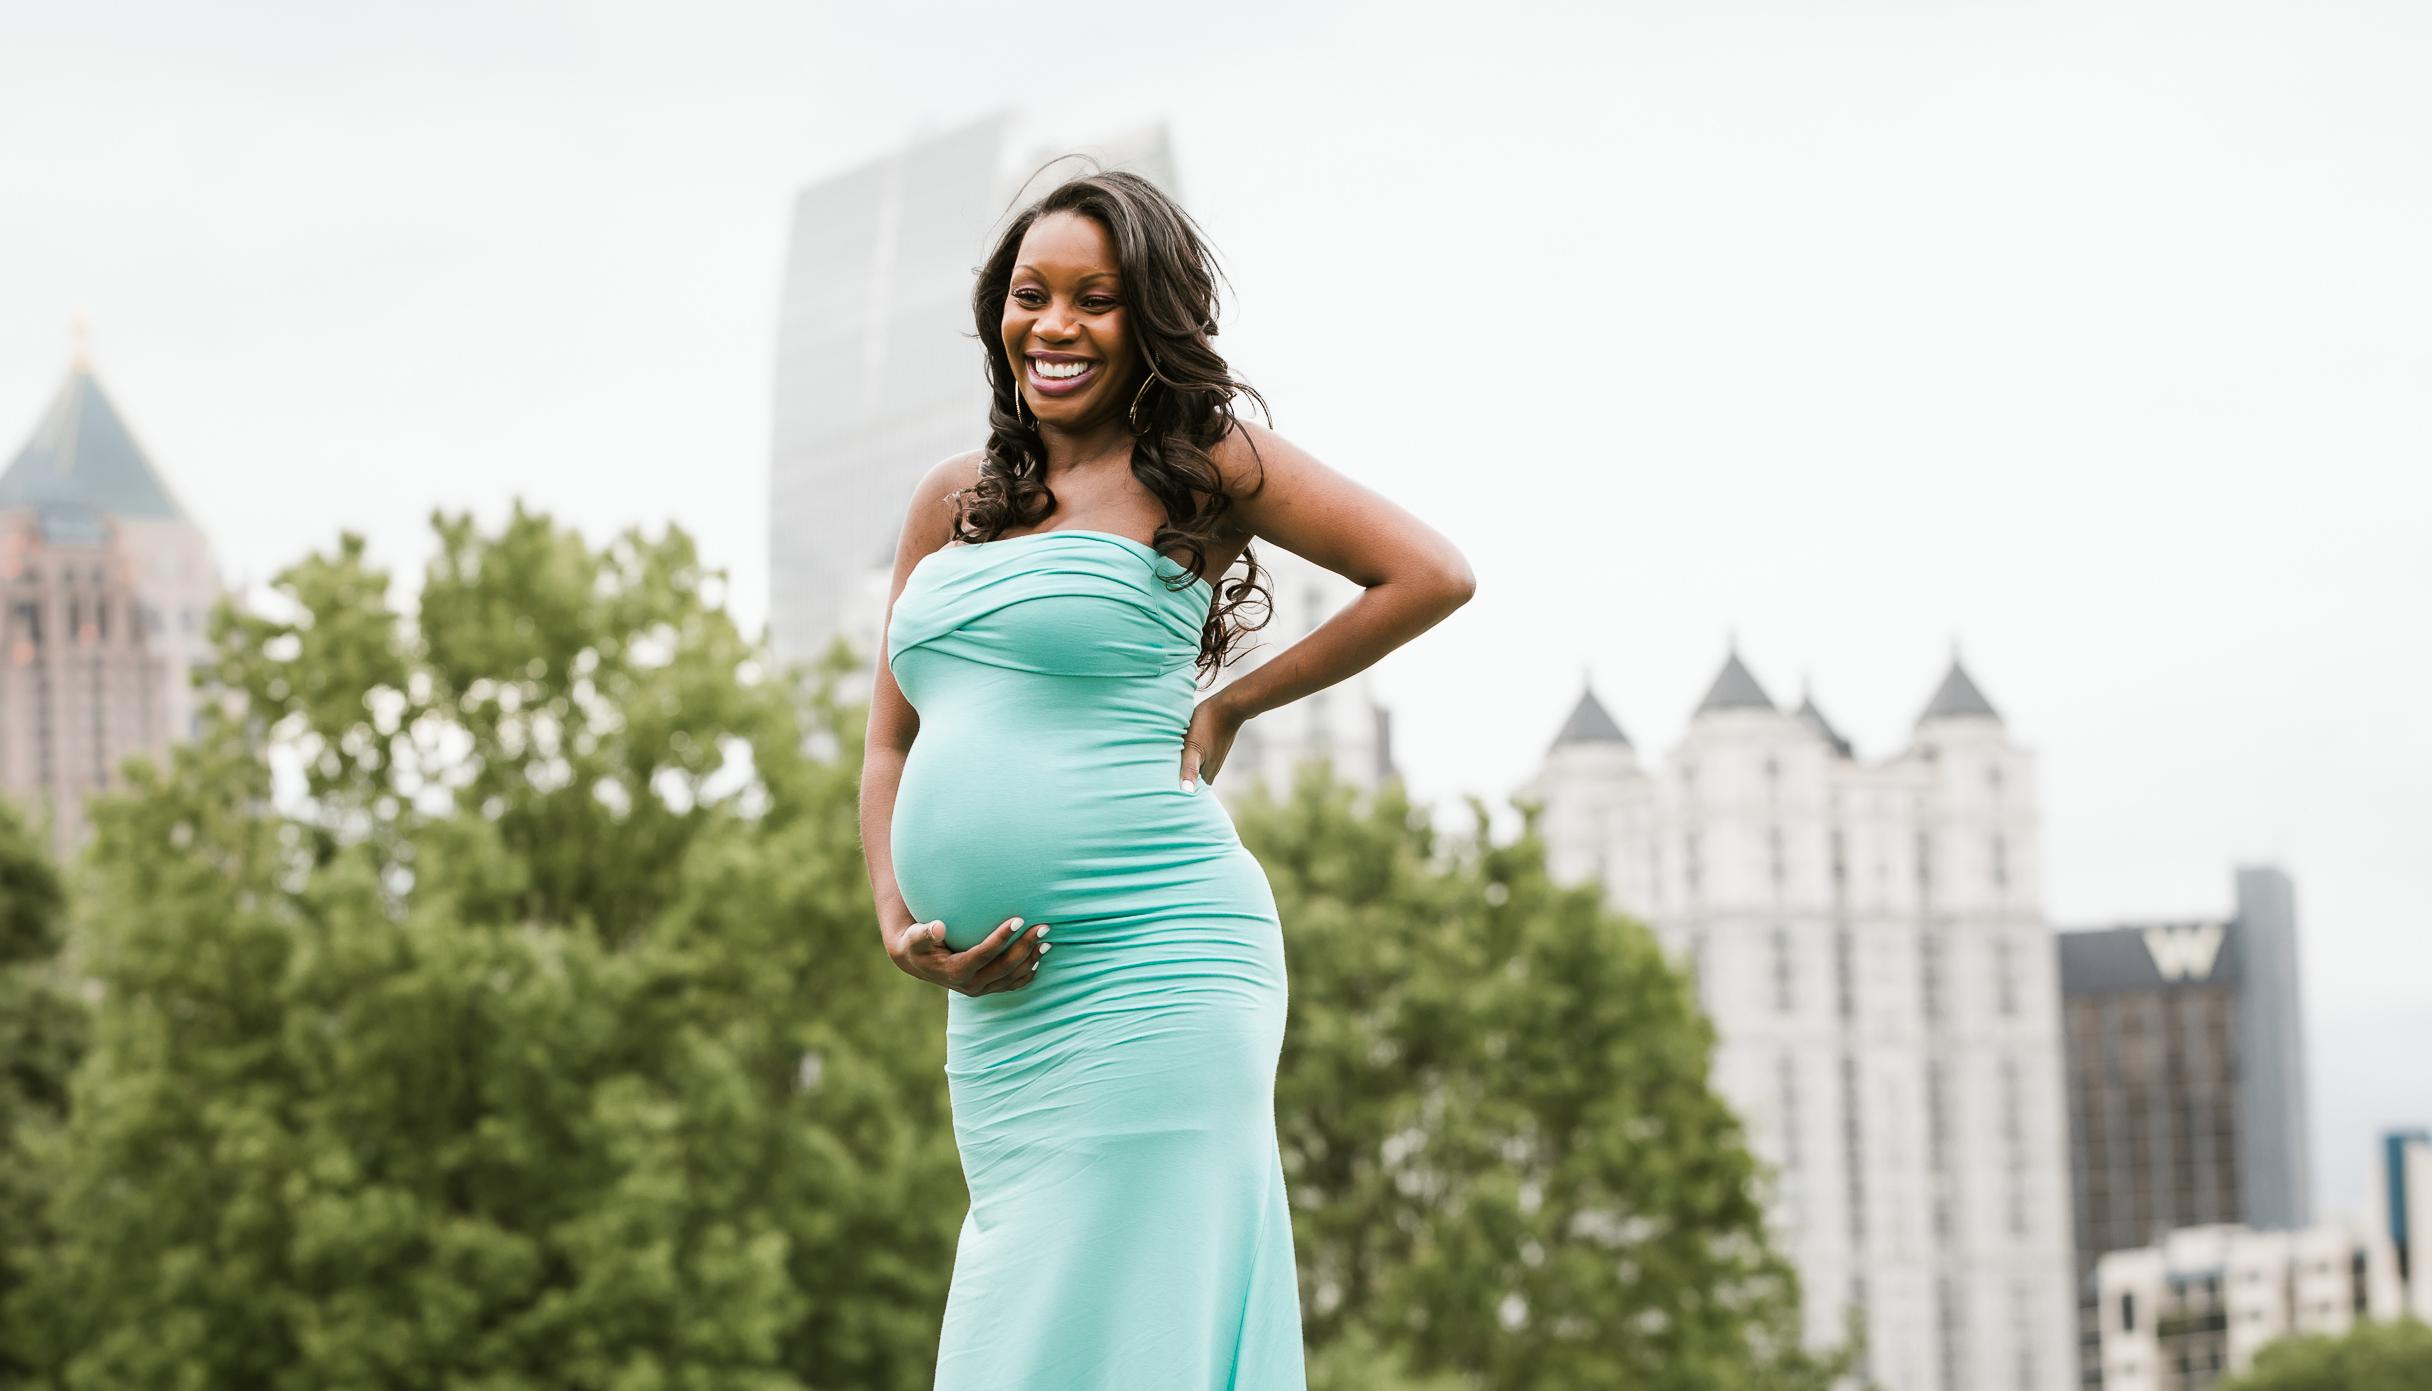 Gianna Keiko Atlanta Piedmont Park Maternity Photographer-5.jpg